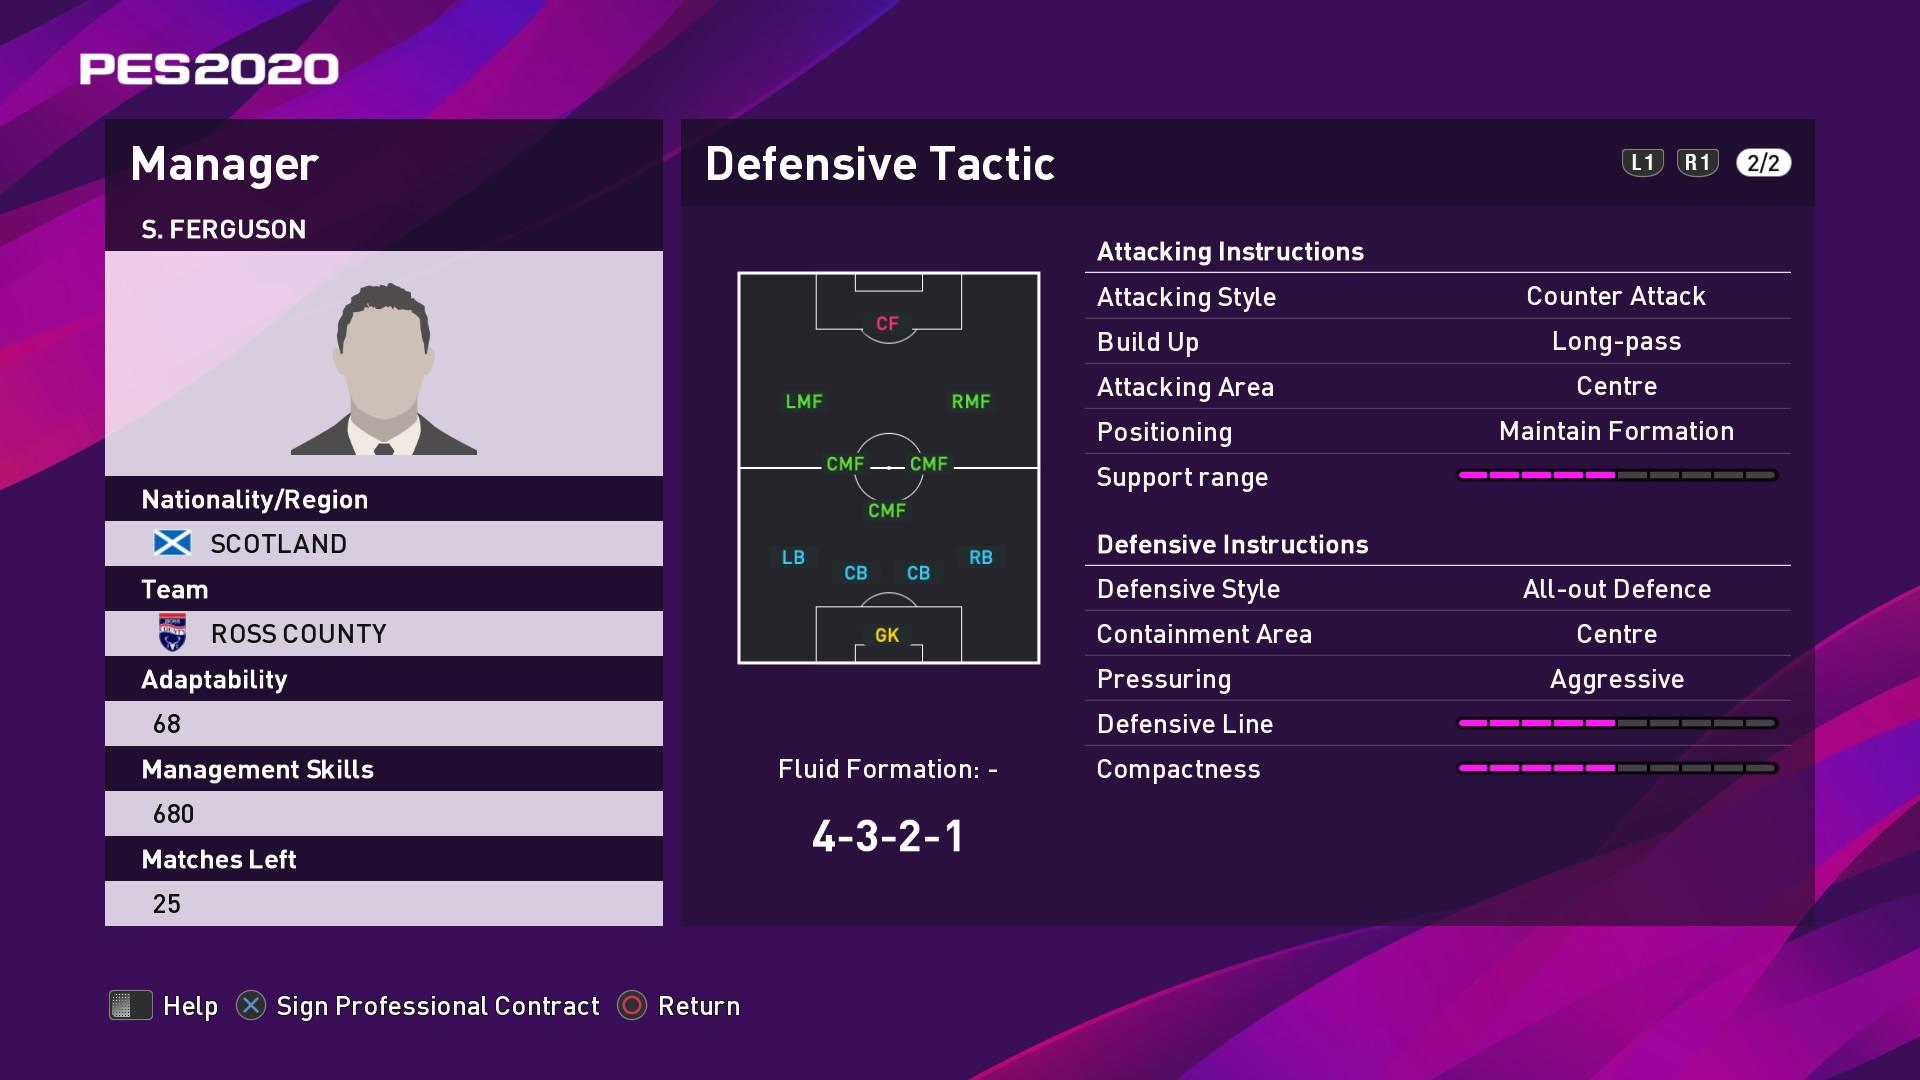 S. Ferguson (Steven Ferguson) Defensive Tactic in PES 2020 myClub